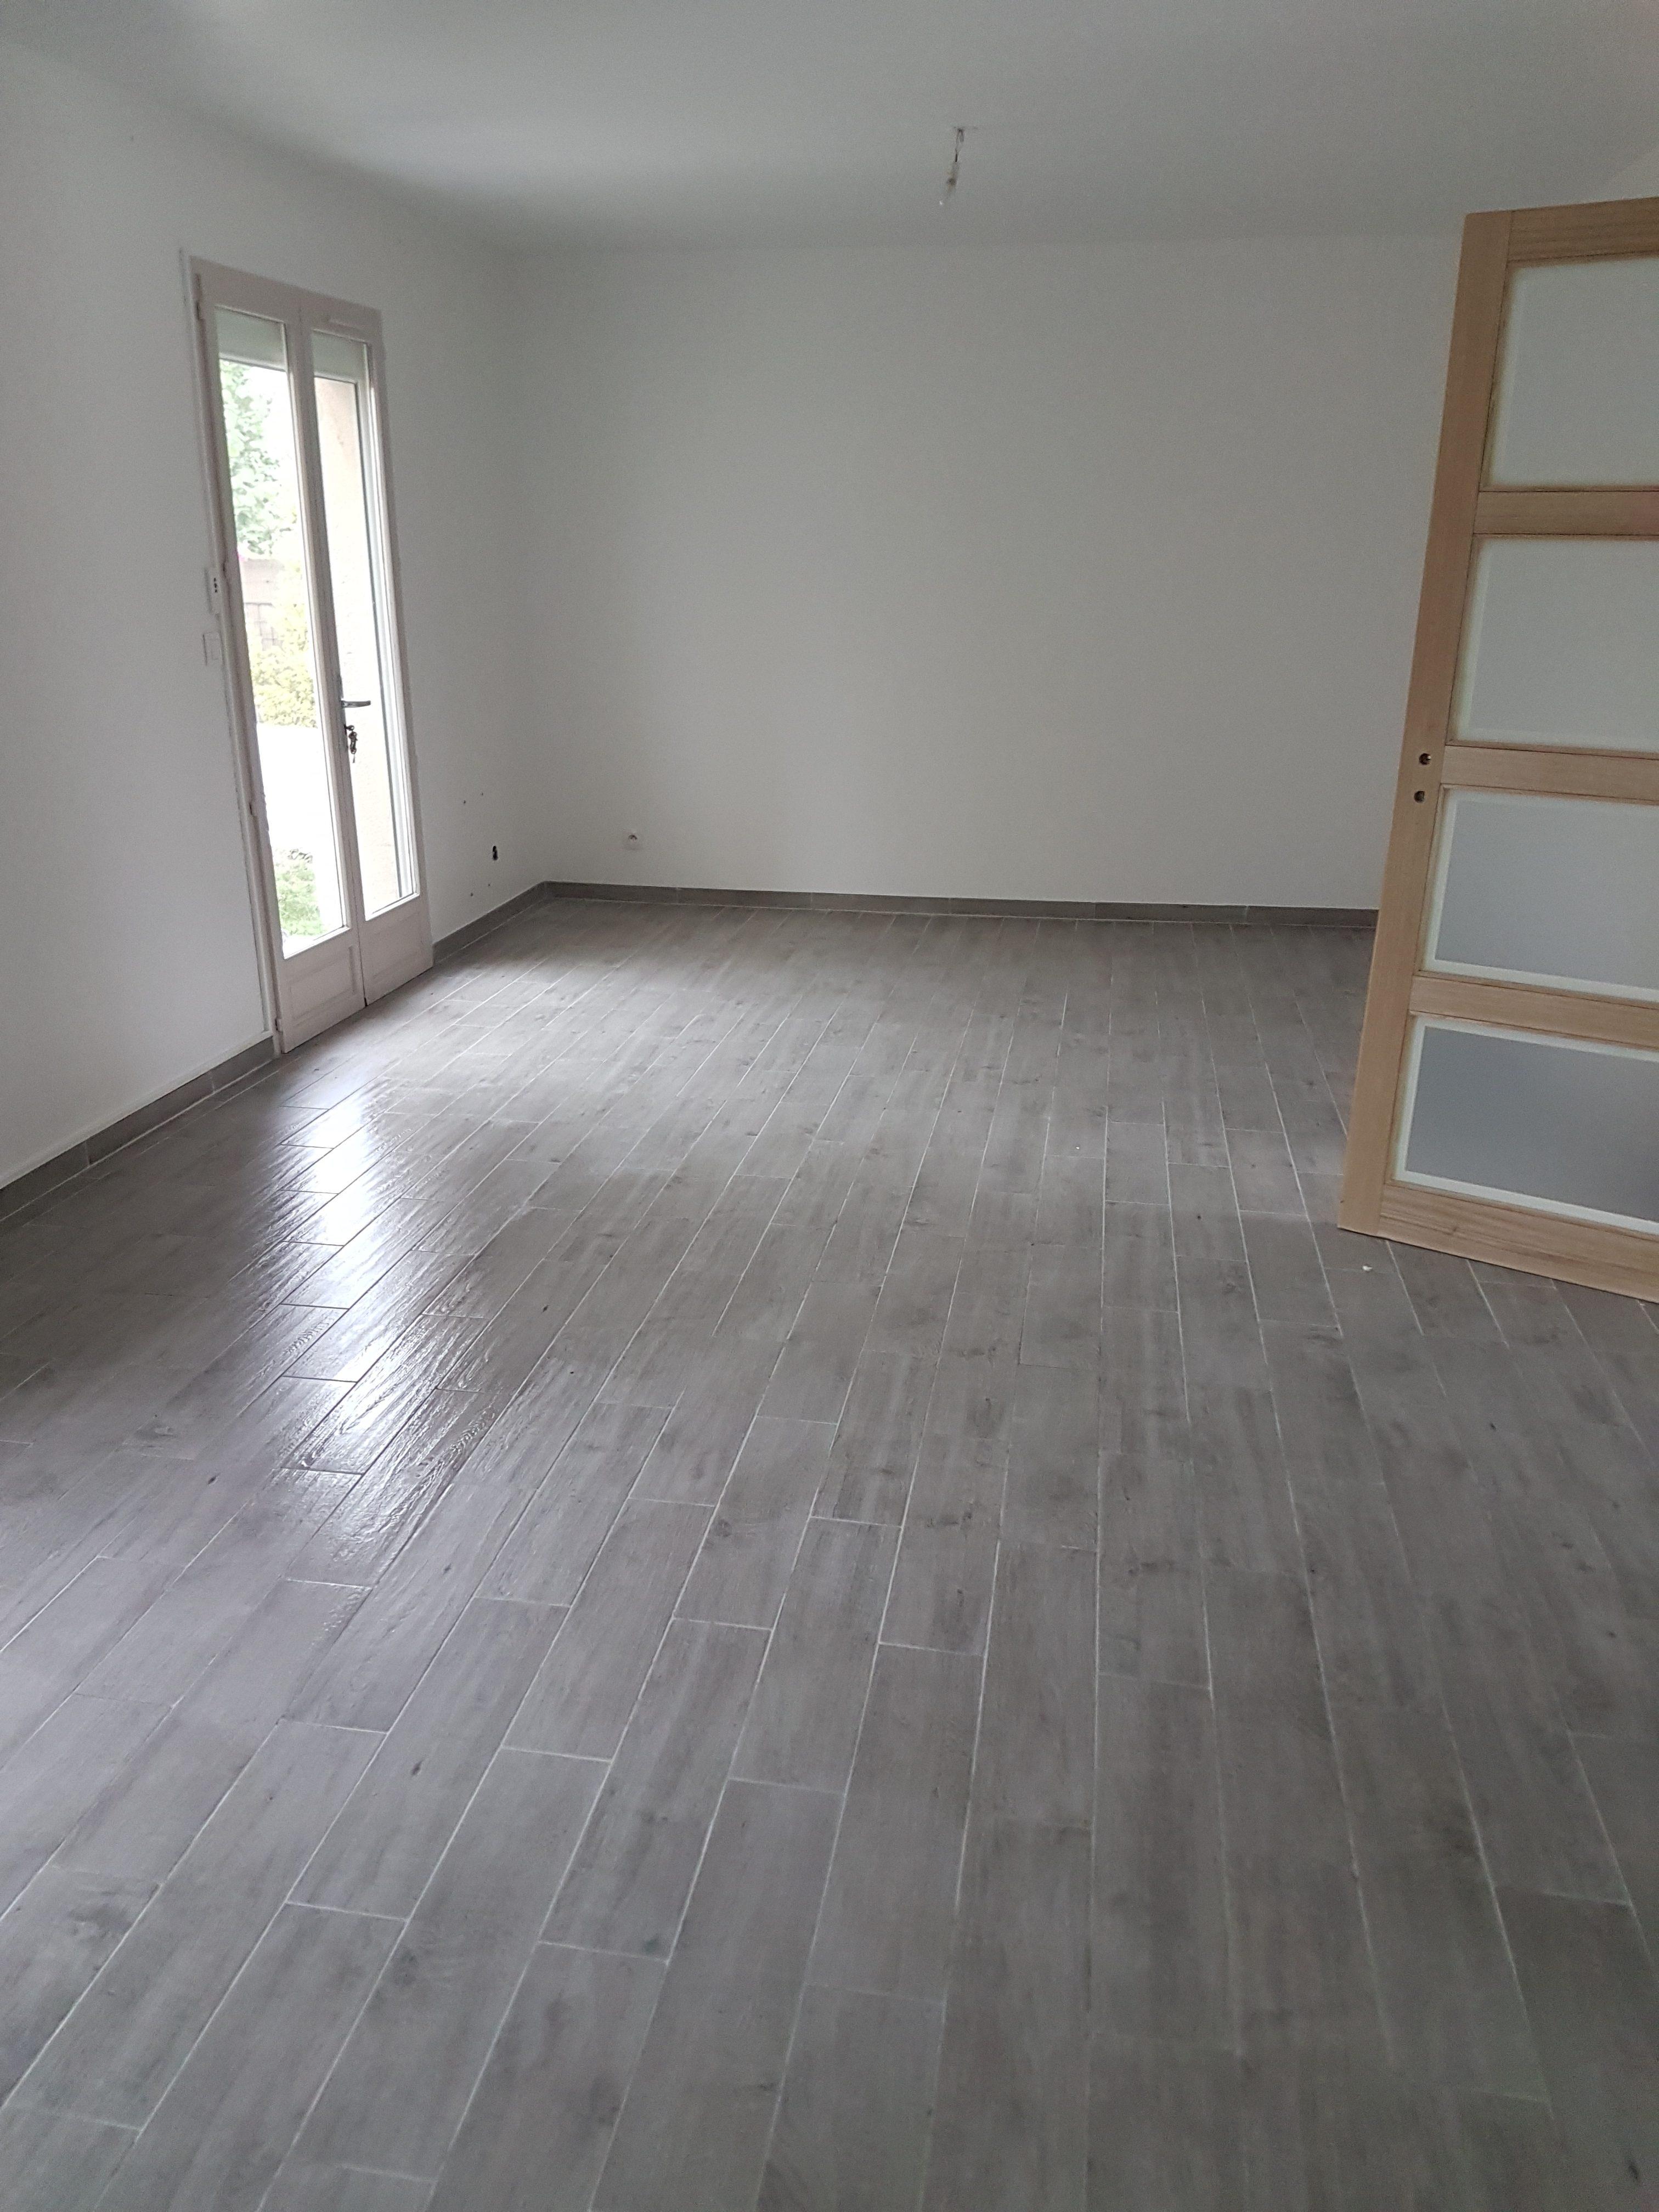 R novation sol salon carrelage imitation parquet - Renovation carrelage sol ...